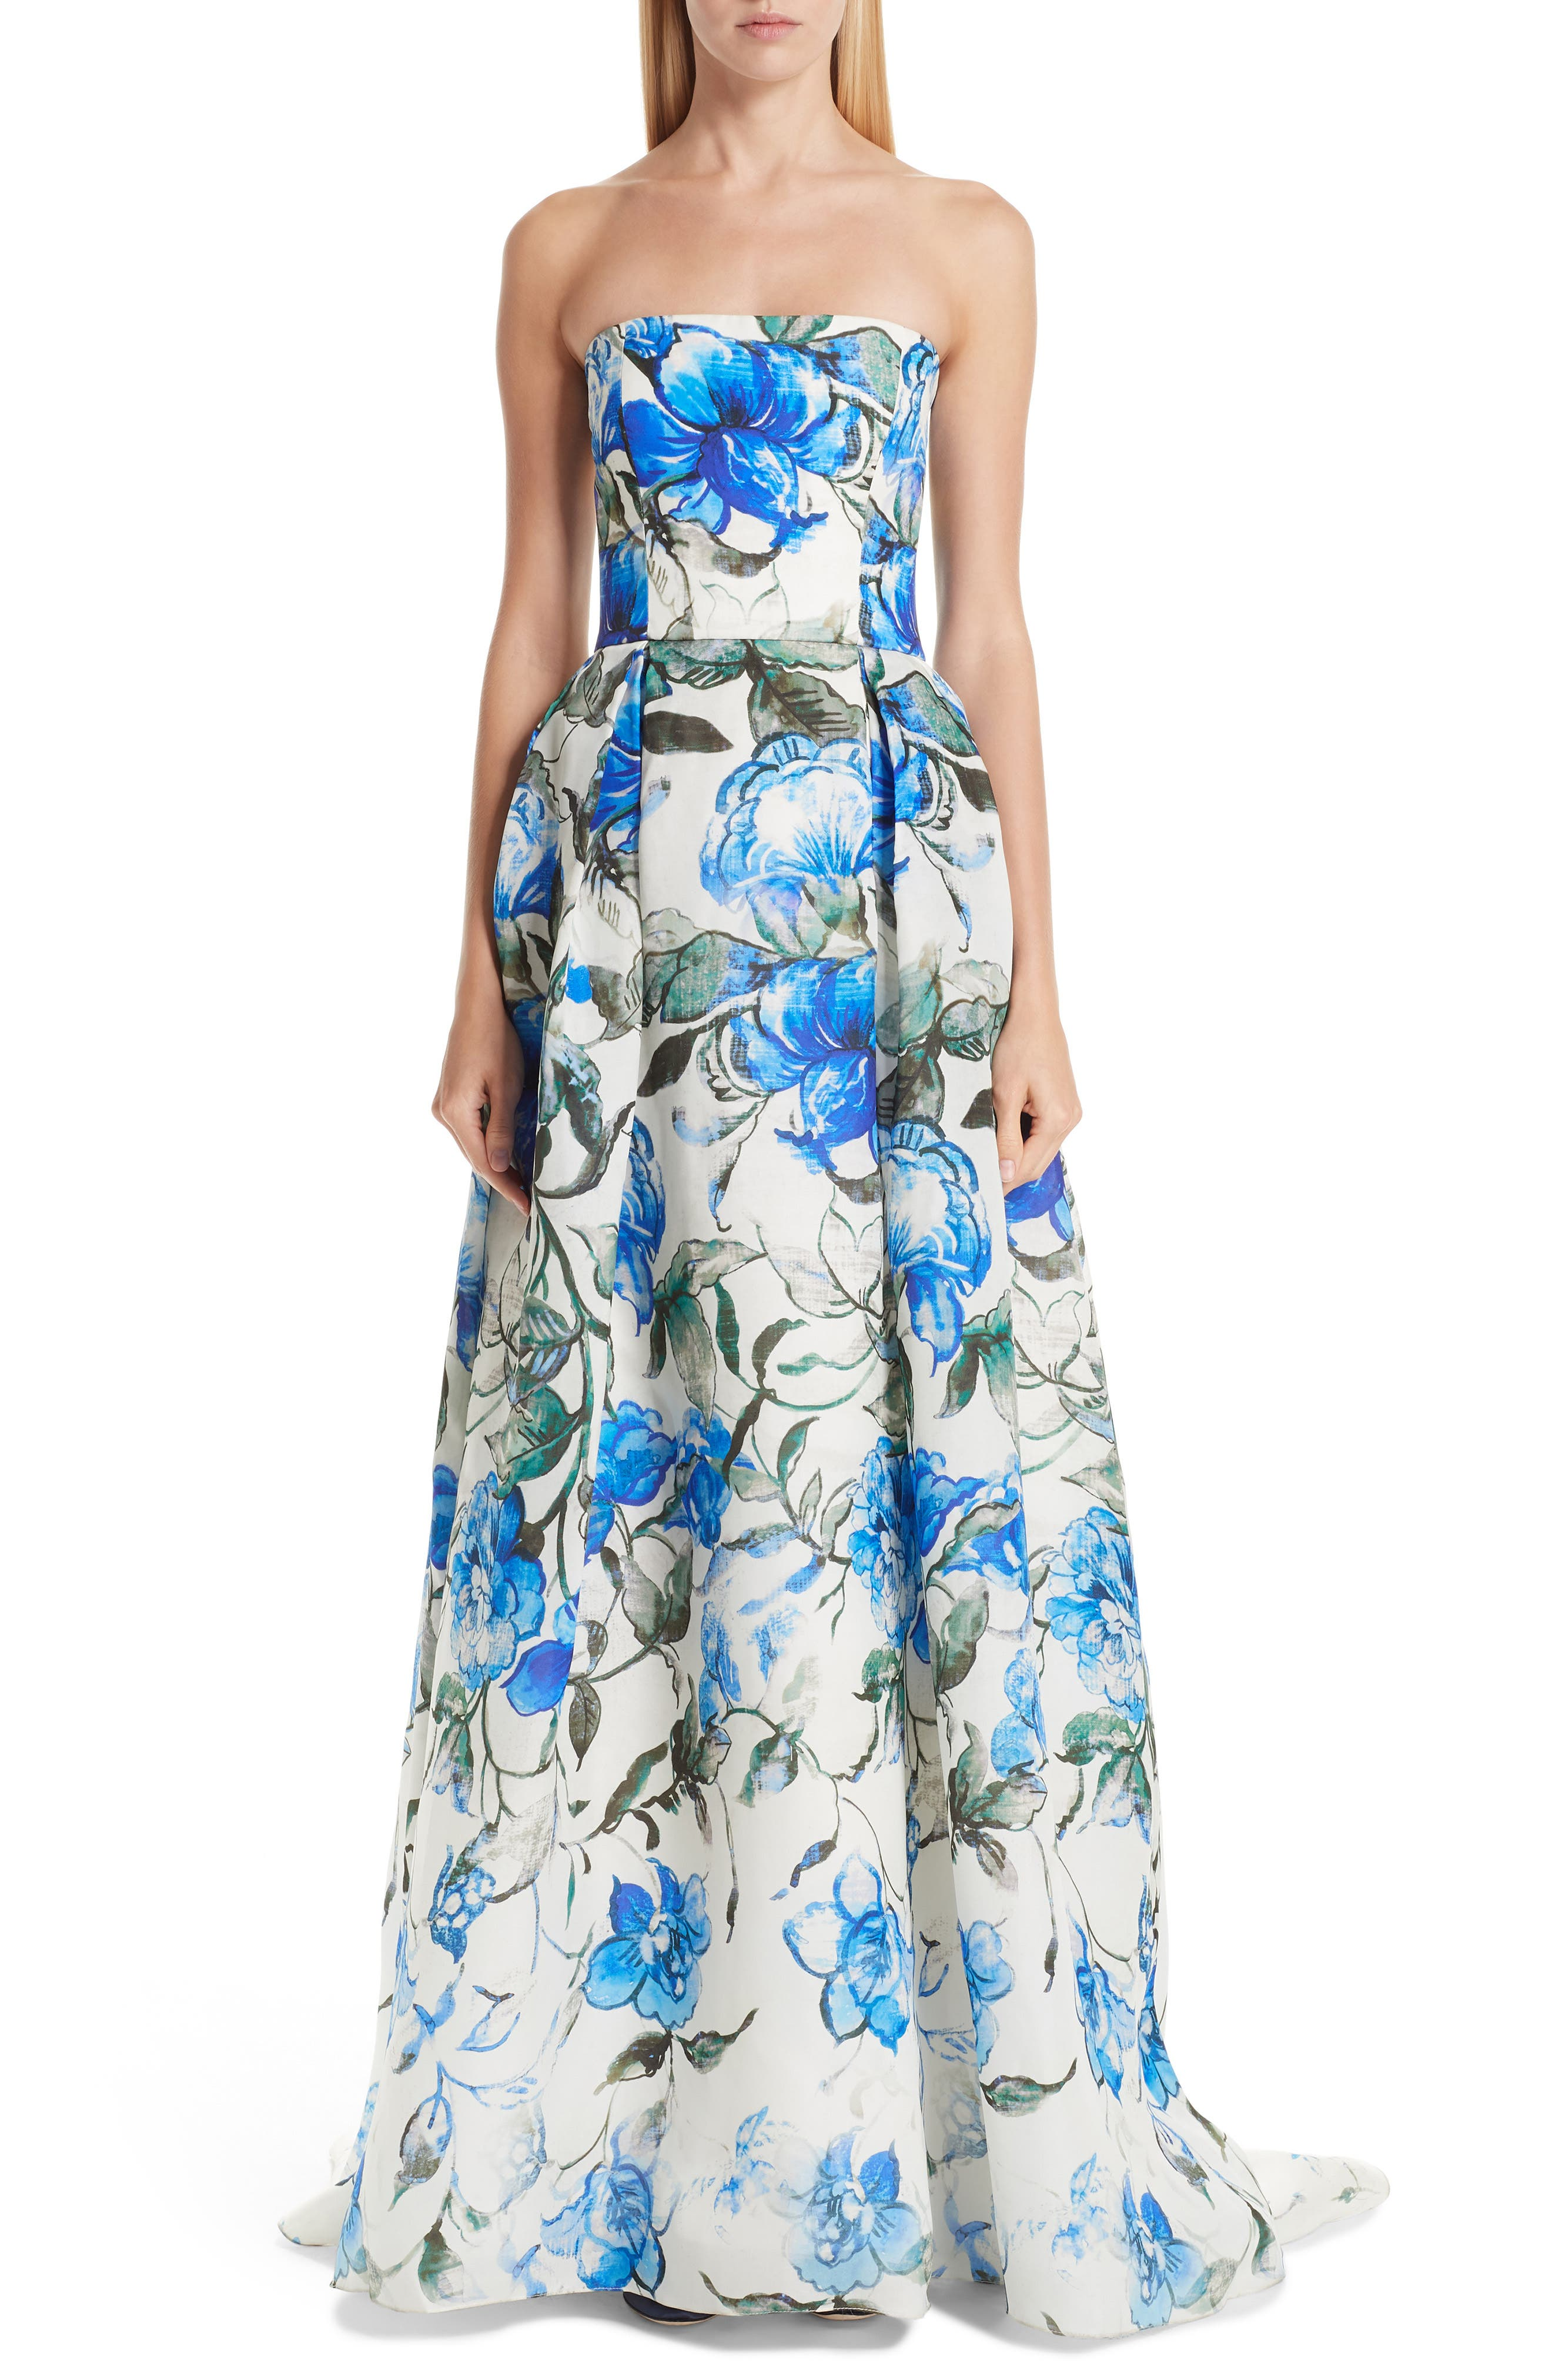 Carolina Herrera Floral Strapless Silk Evening Dress